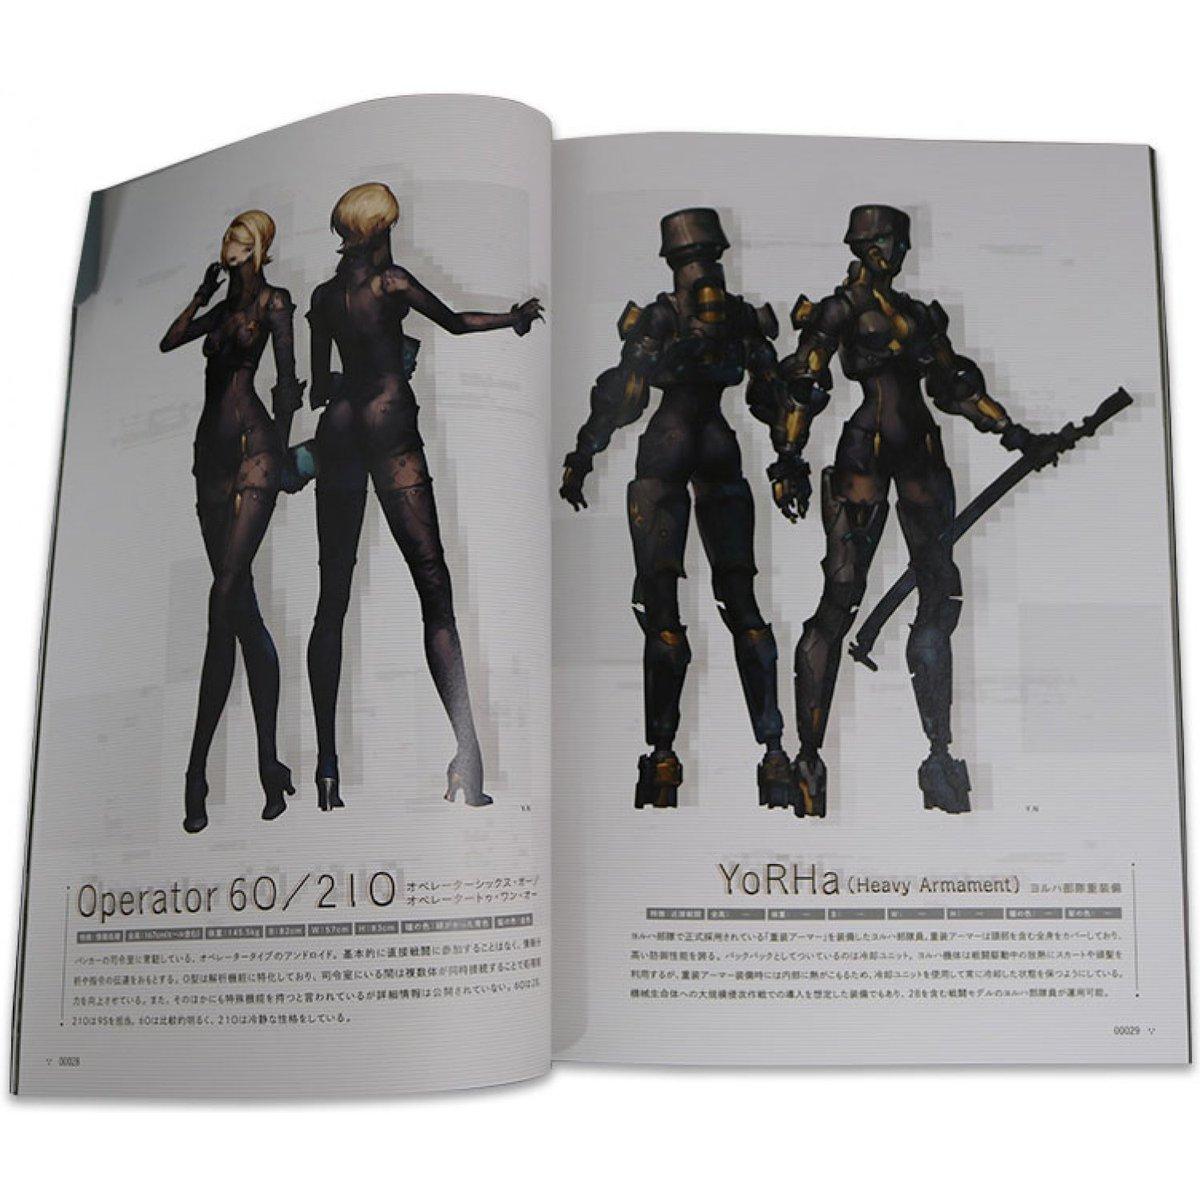 NieR Automata World Guide Art Illustrations Art book Japan